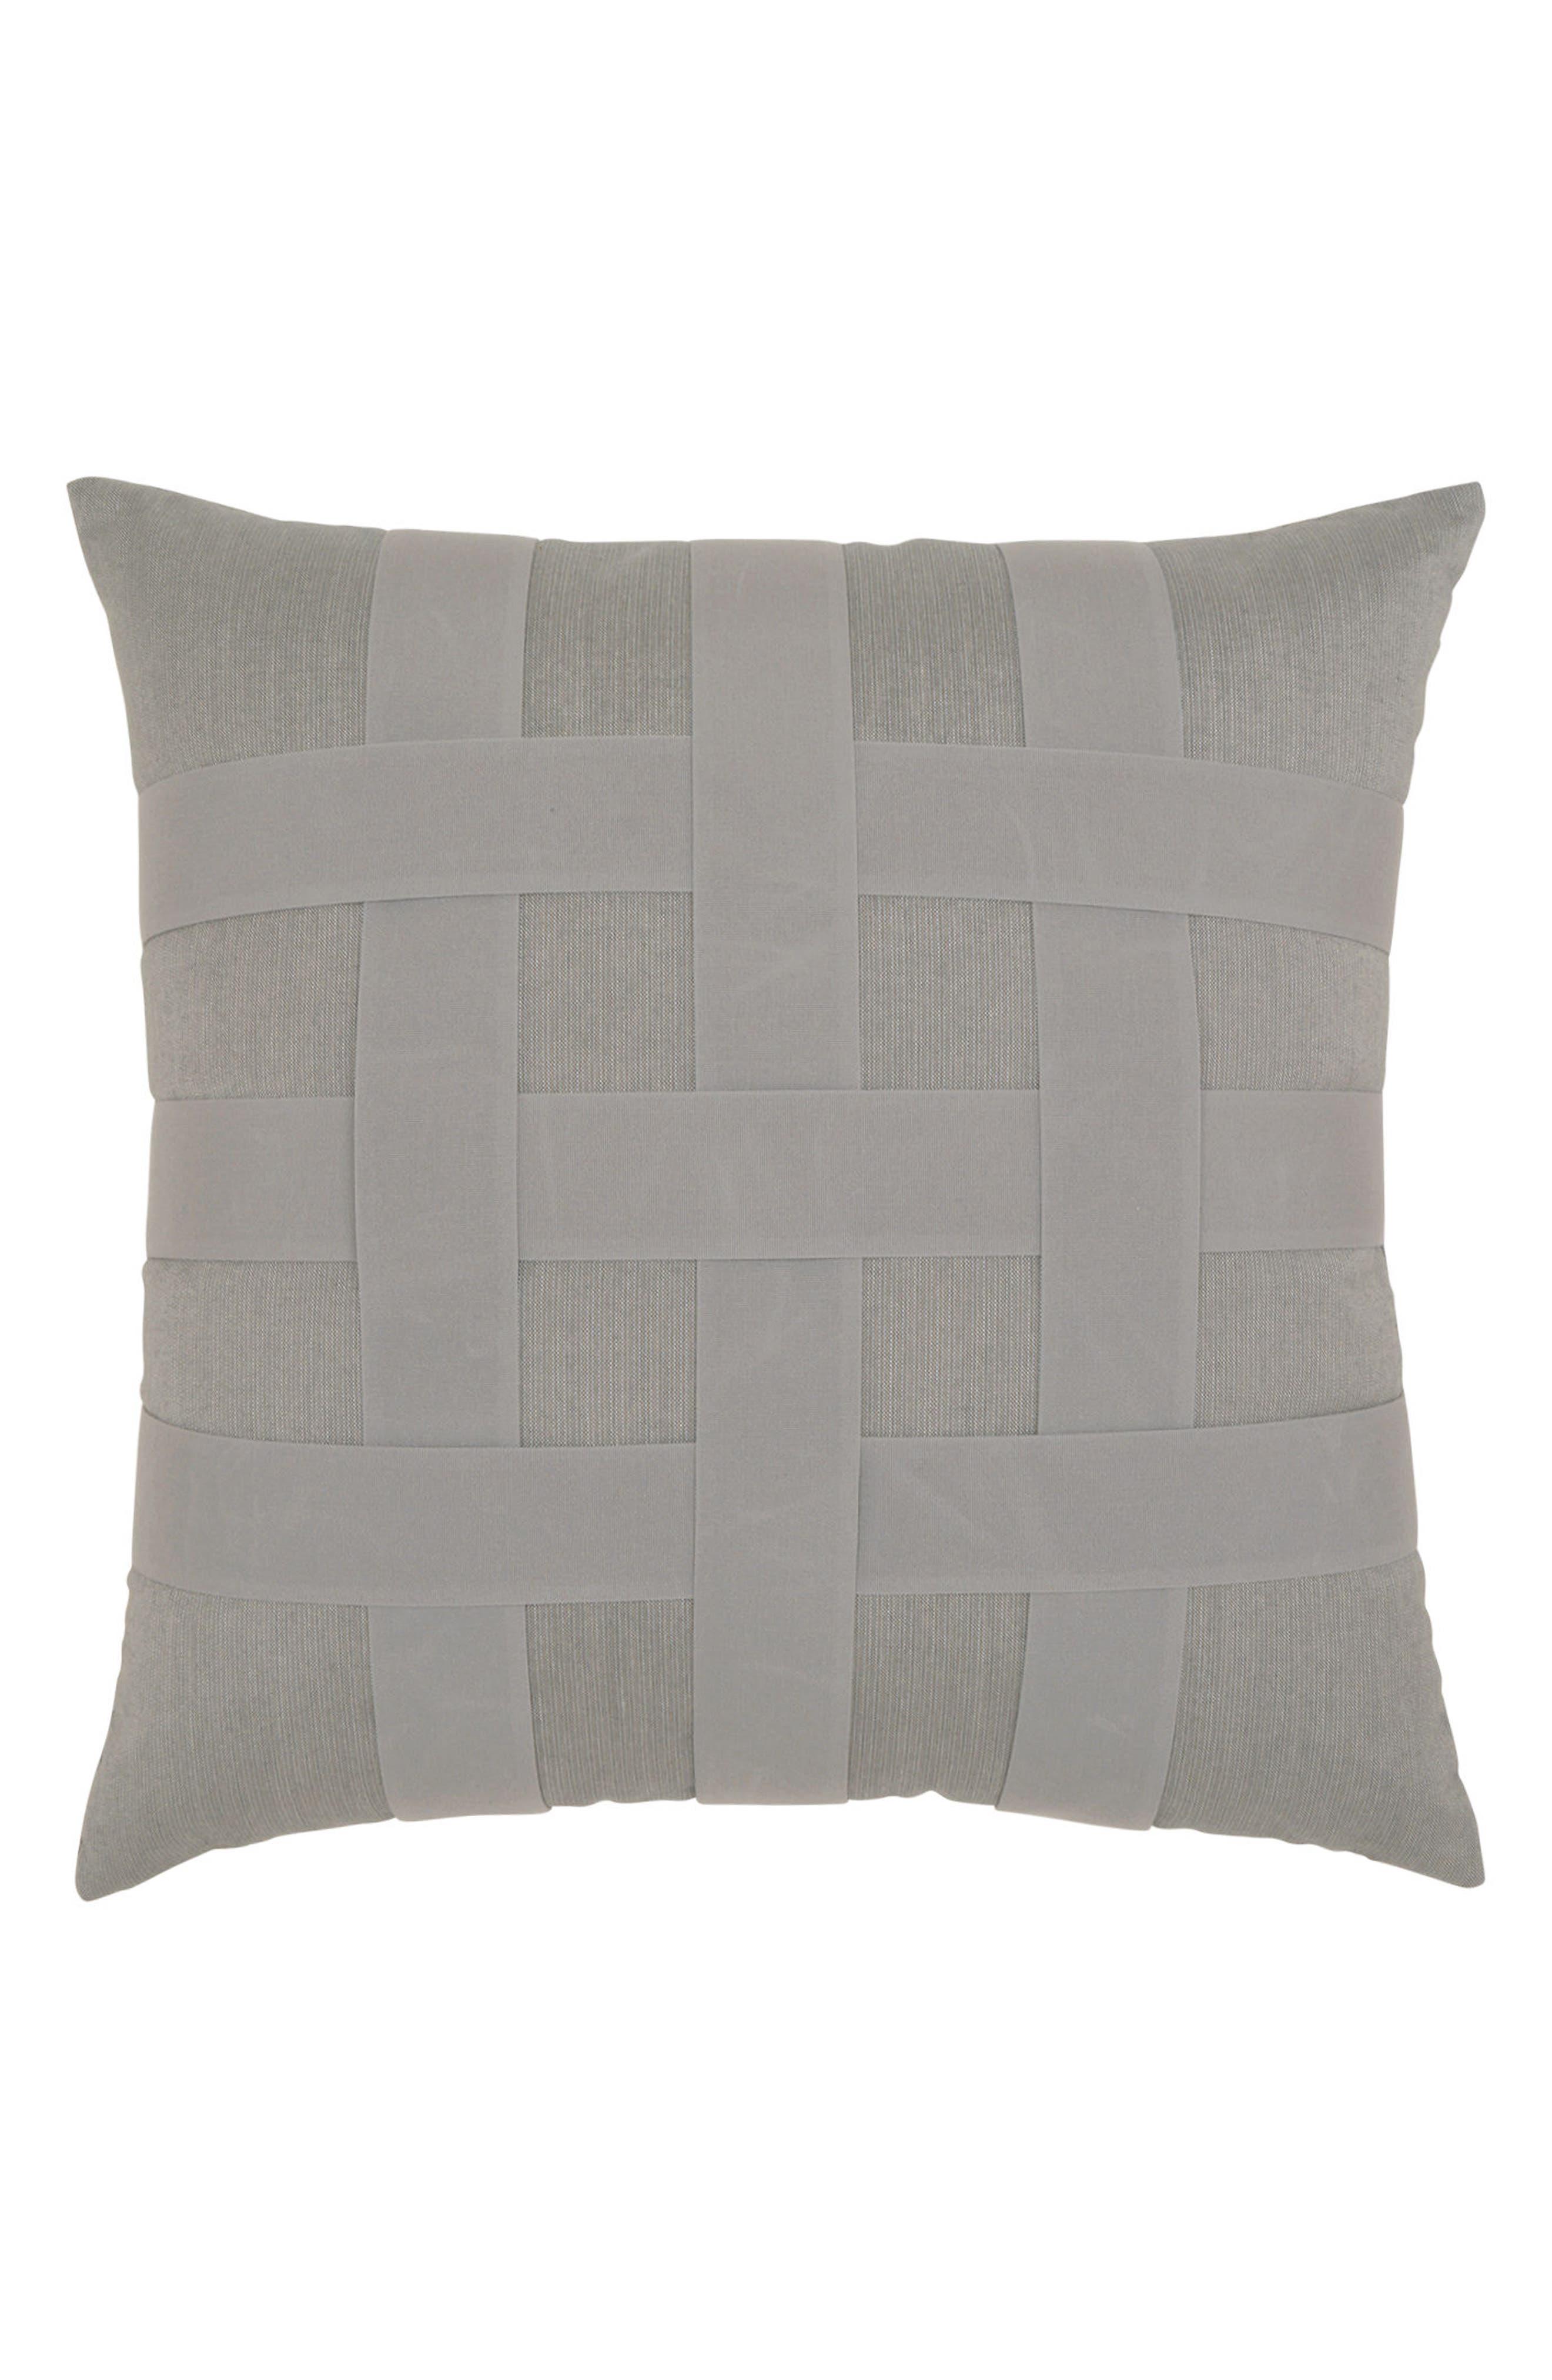 Basket Weave Indoor/Outdoor Accent Pillow,                         Main,                         color, 020